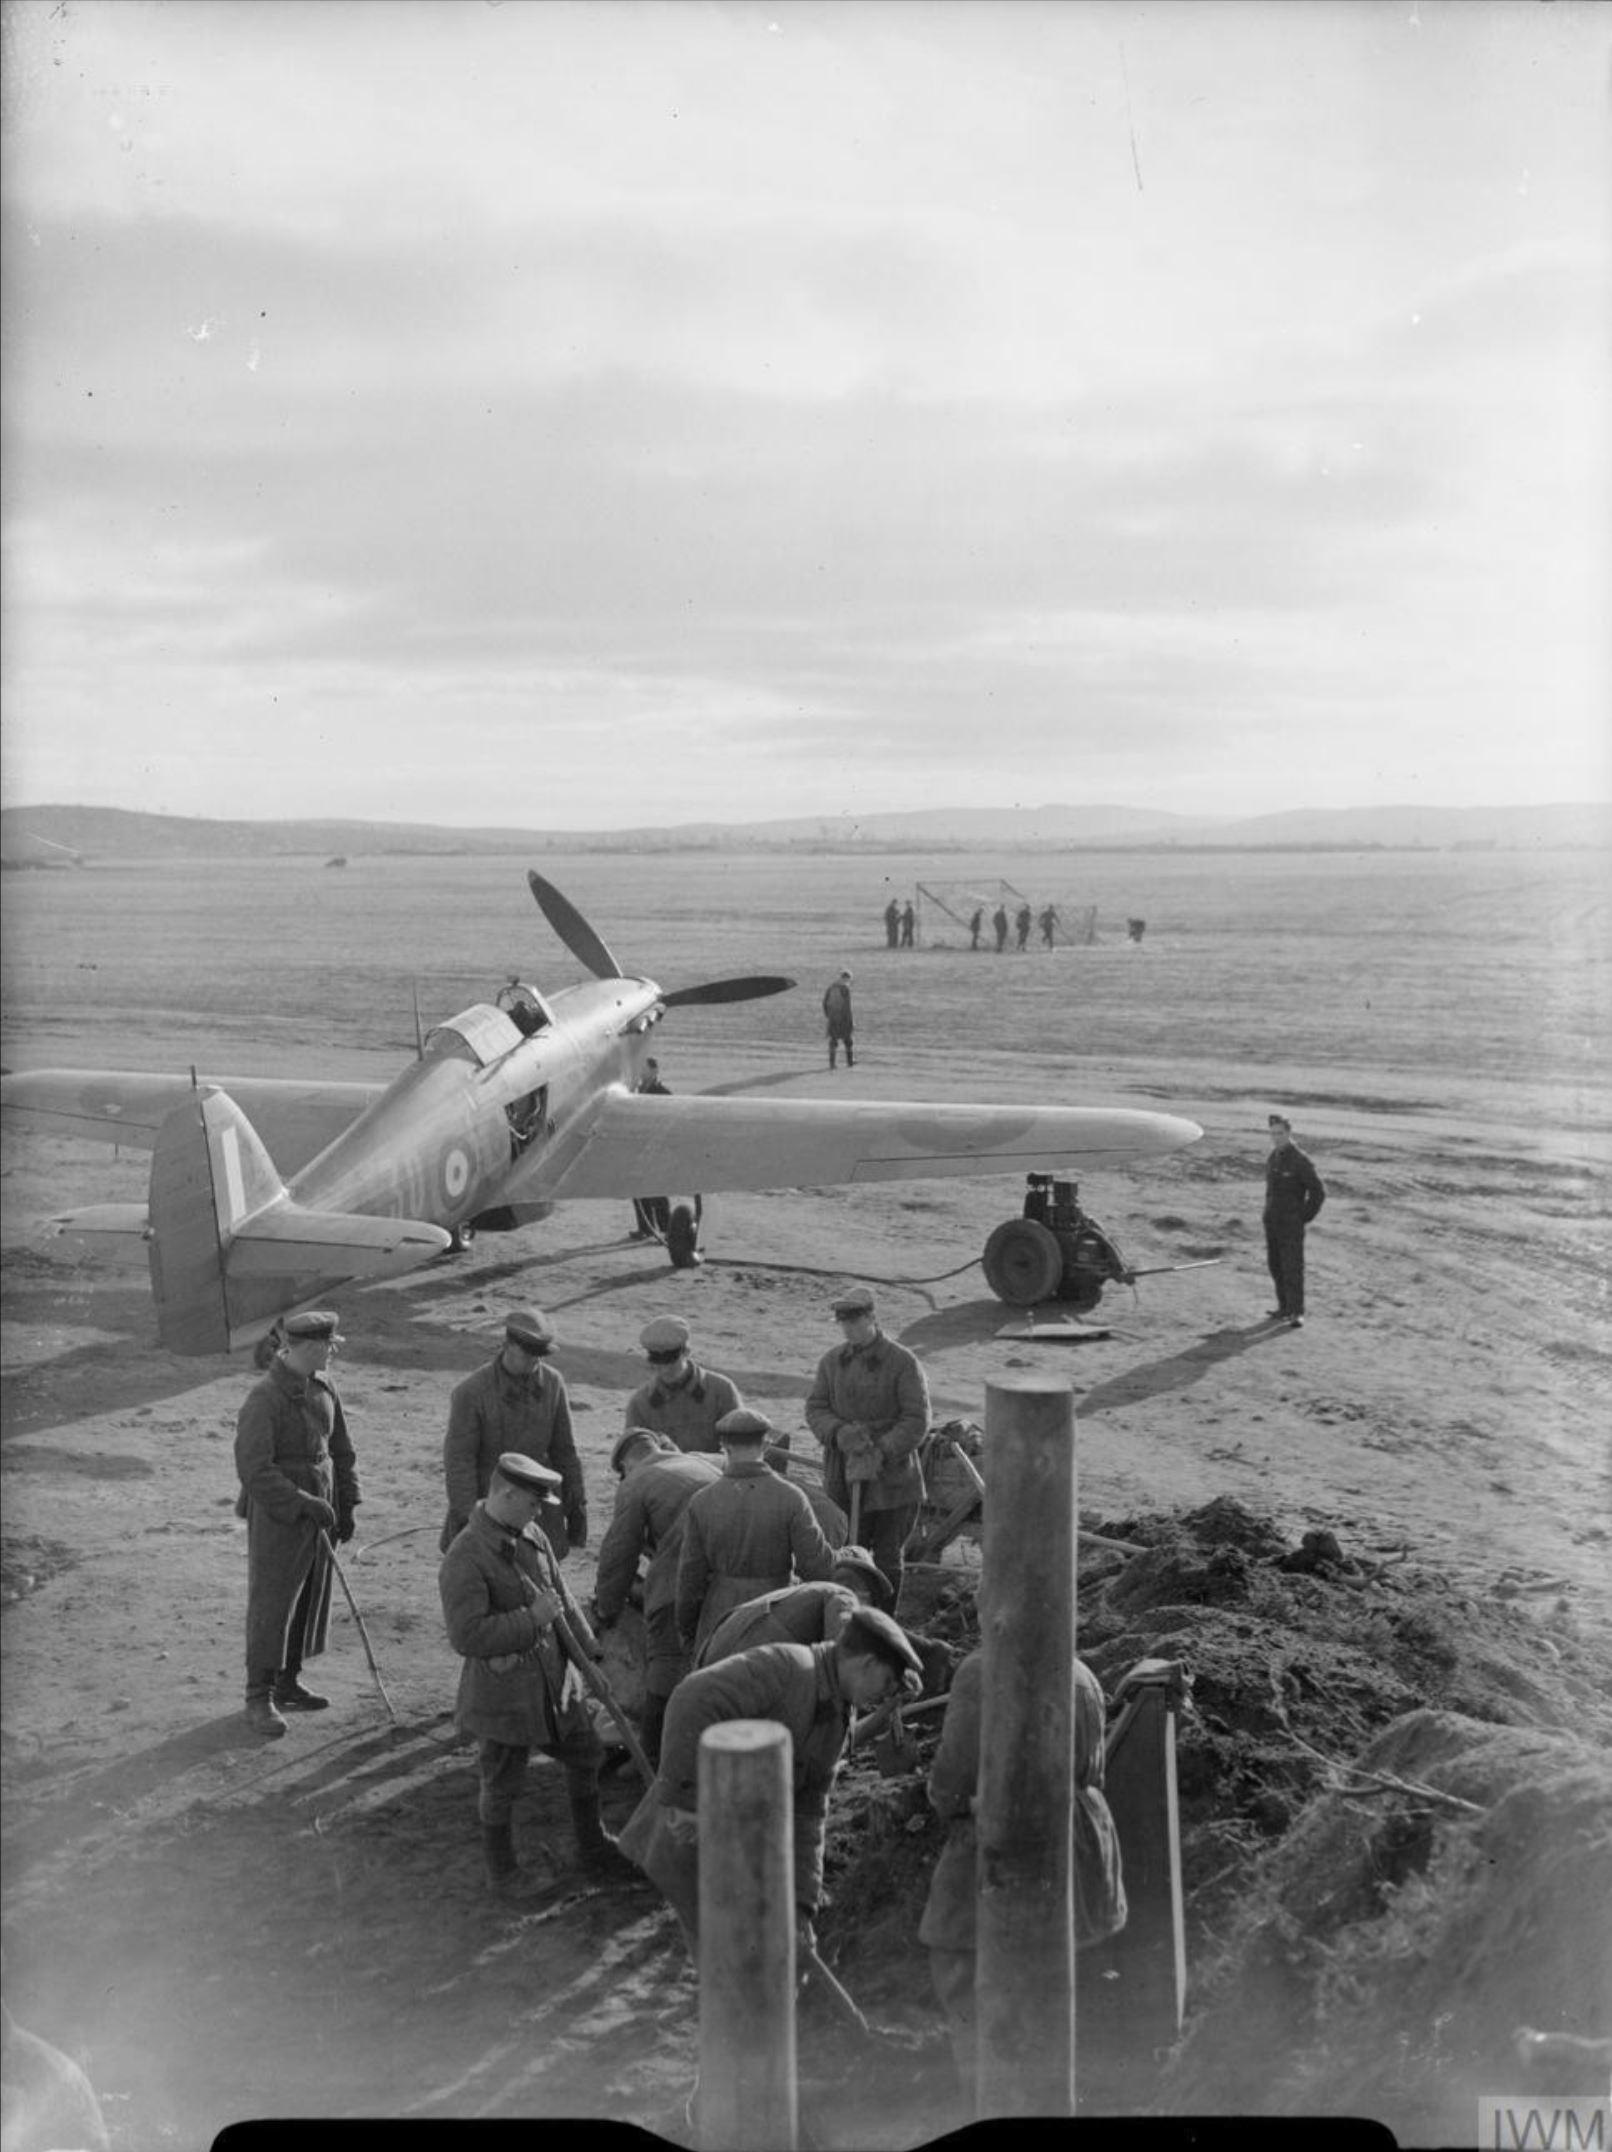 Hurricane IIb Trop RAF 151 Wing 134Sqn GY30 Capt Jack Ross Z3763 Vaenga IWM CR183